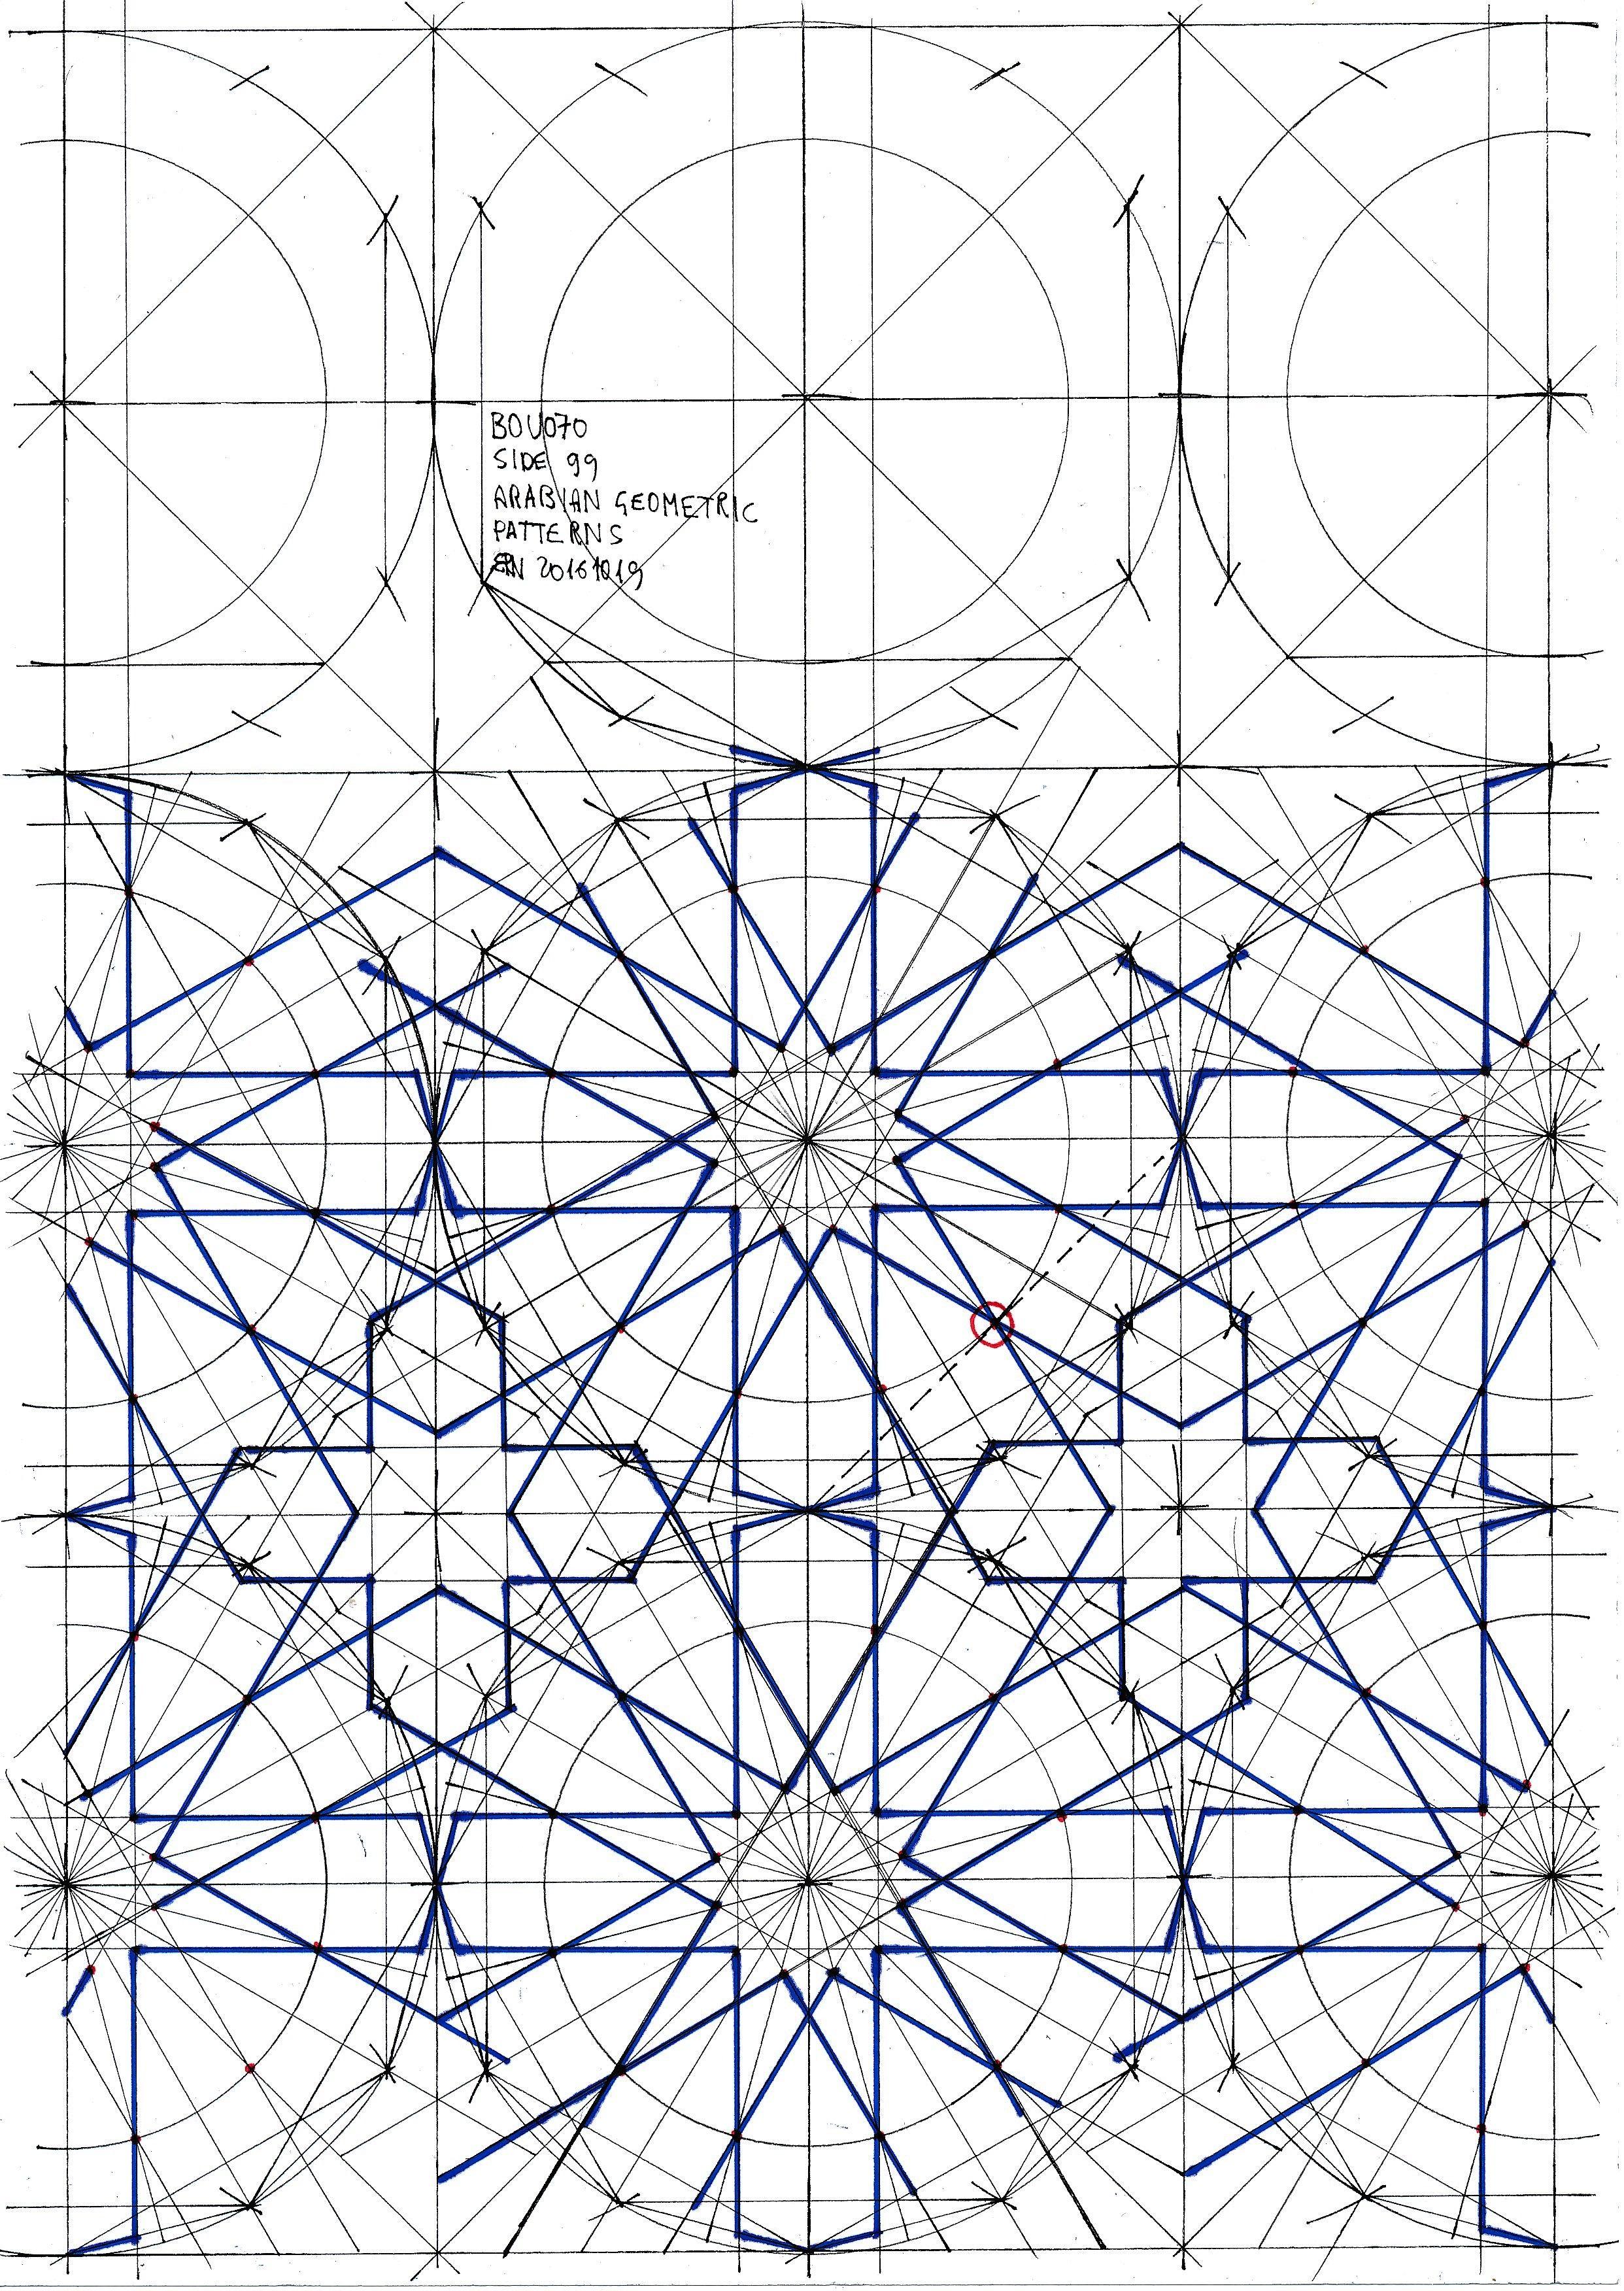 Bou070 #islamicdesign #islamicgeometry #islamicart